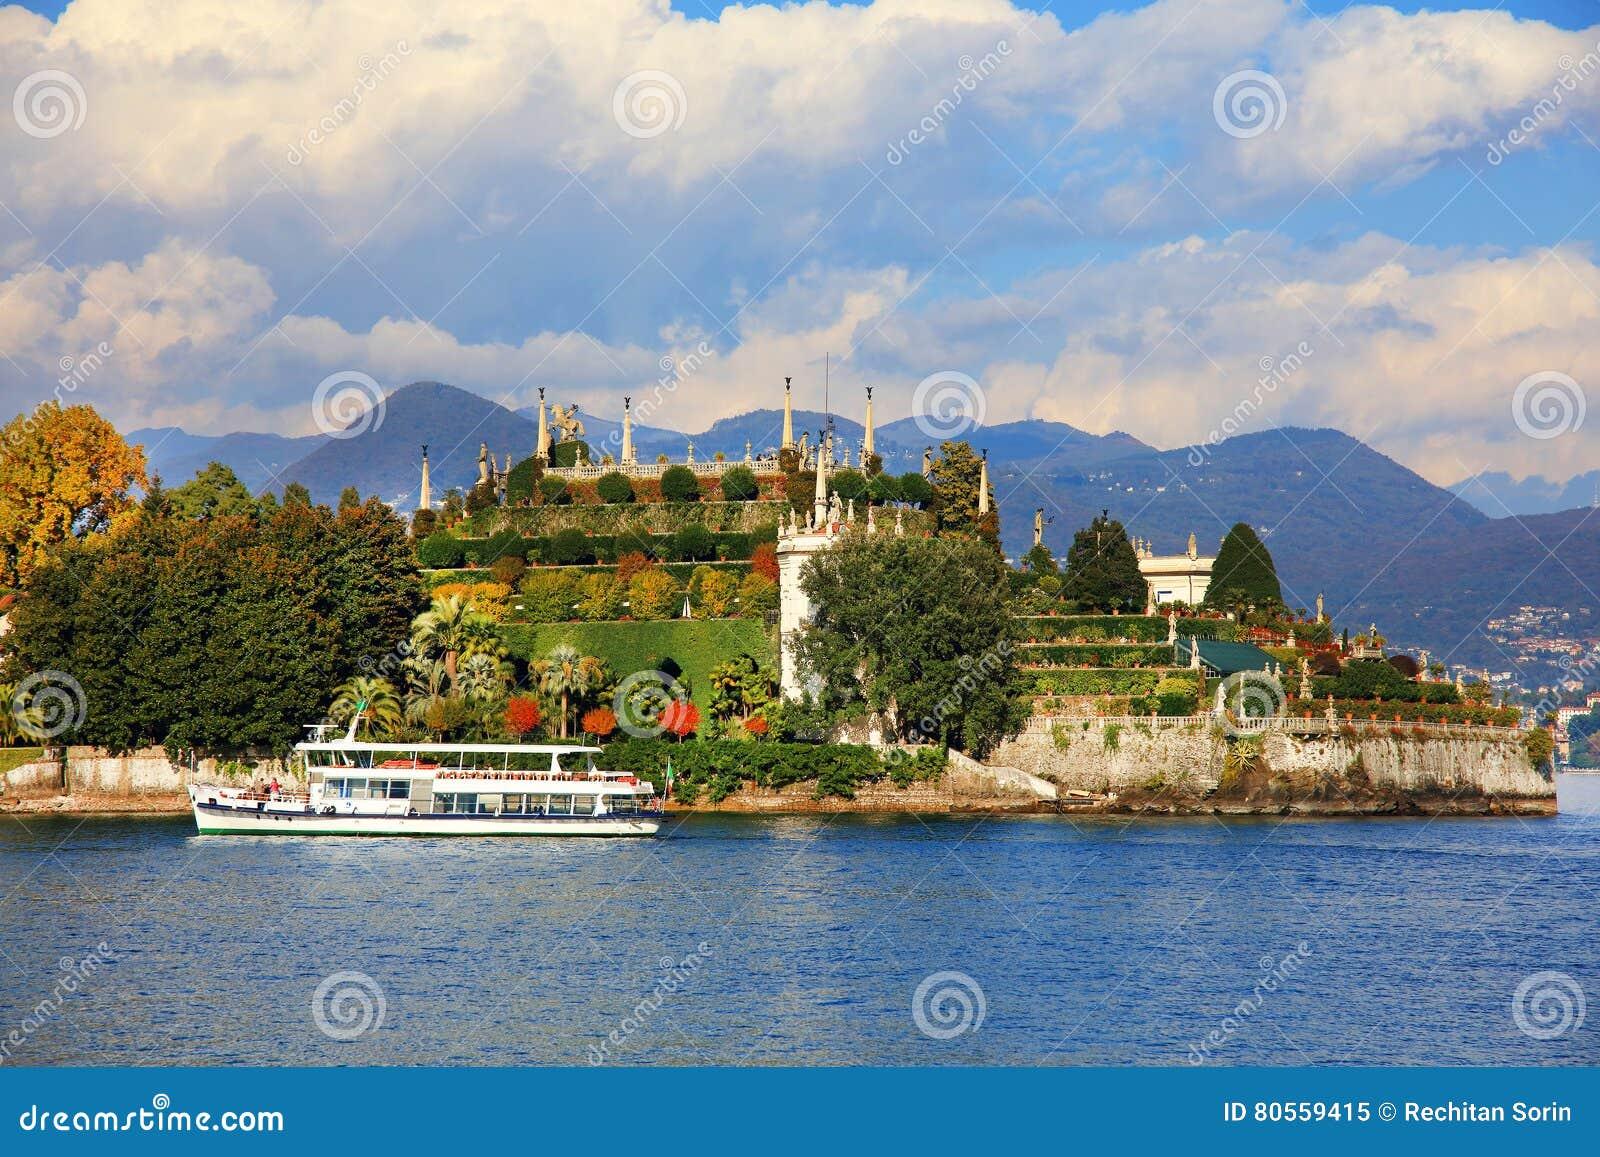 Toneelmening van Isola Bella, Lago Maggiore, Italië, Europa